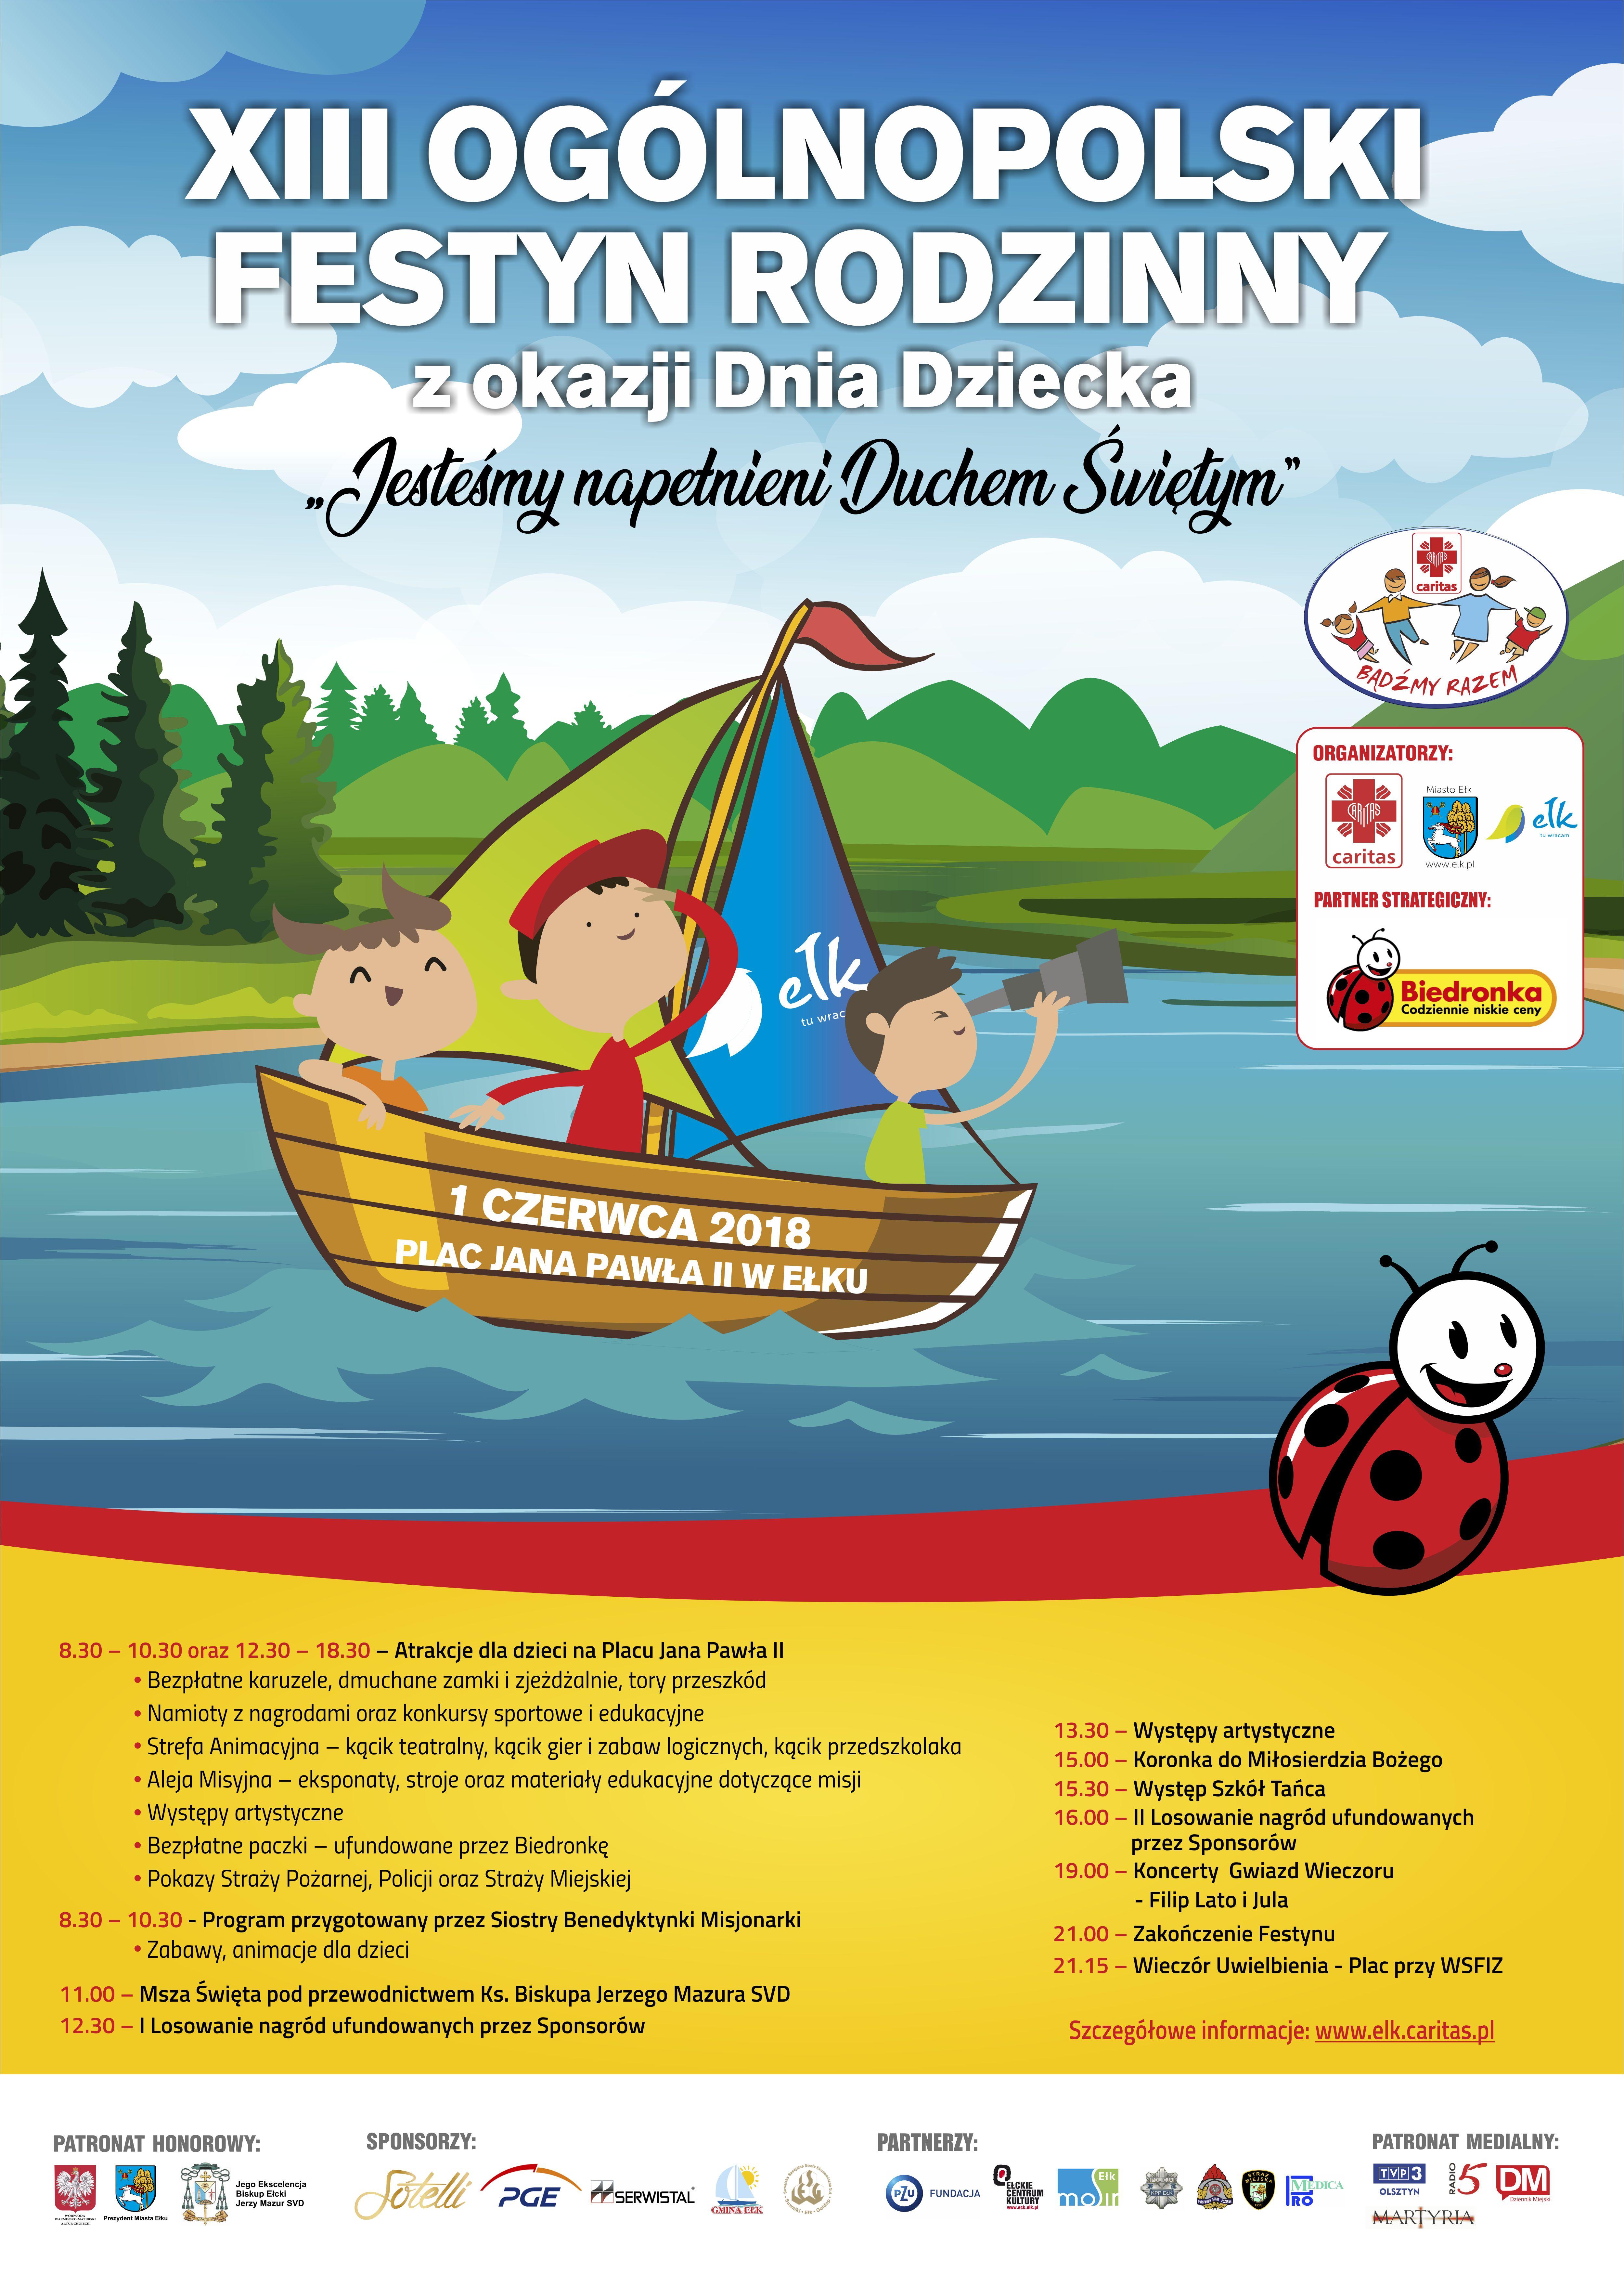 http://m.wm.pl/2018/05/orig/dzien-dziecka-plakat-469401.jpg